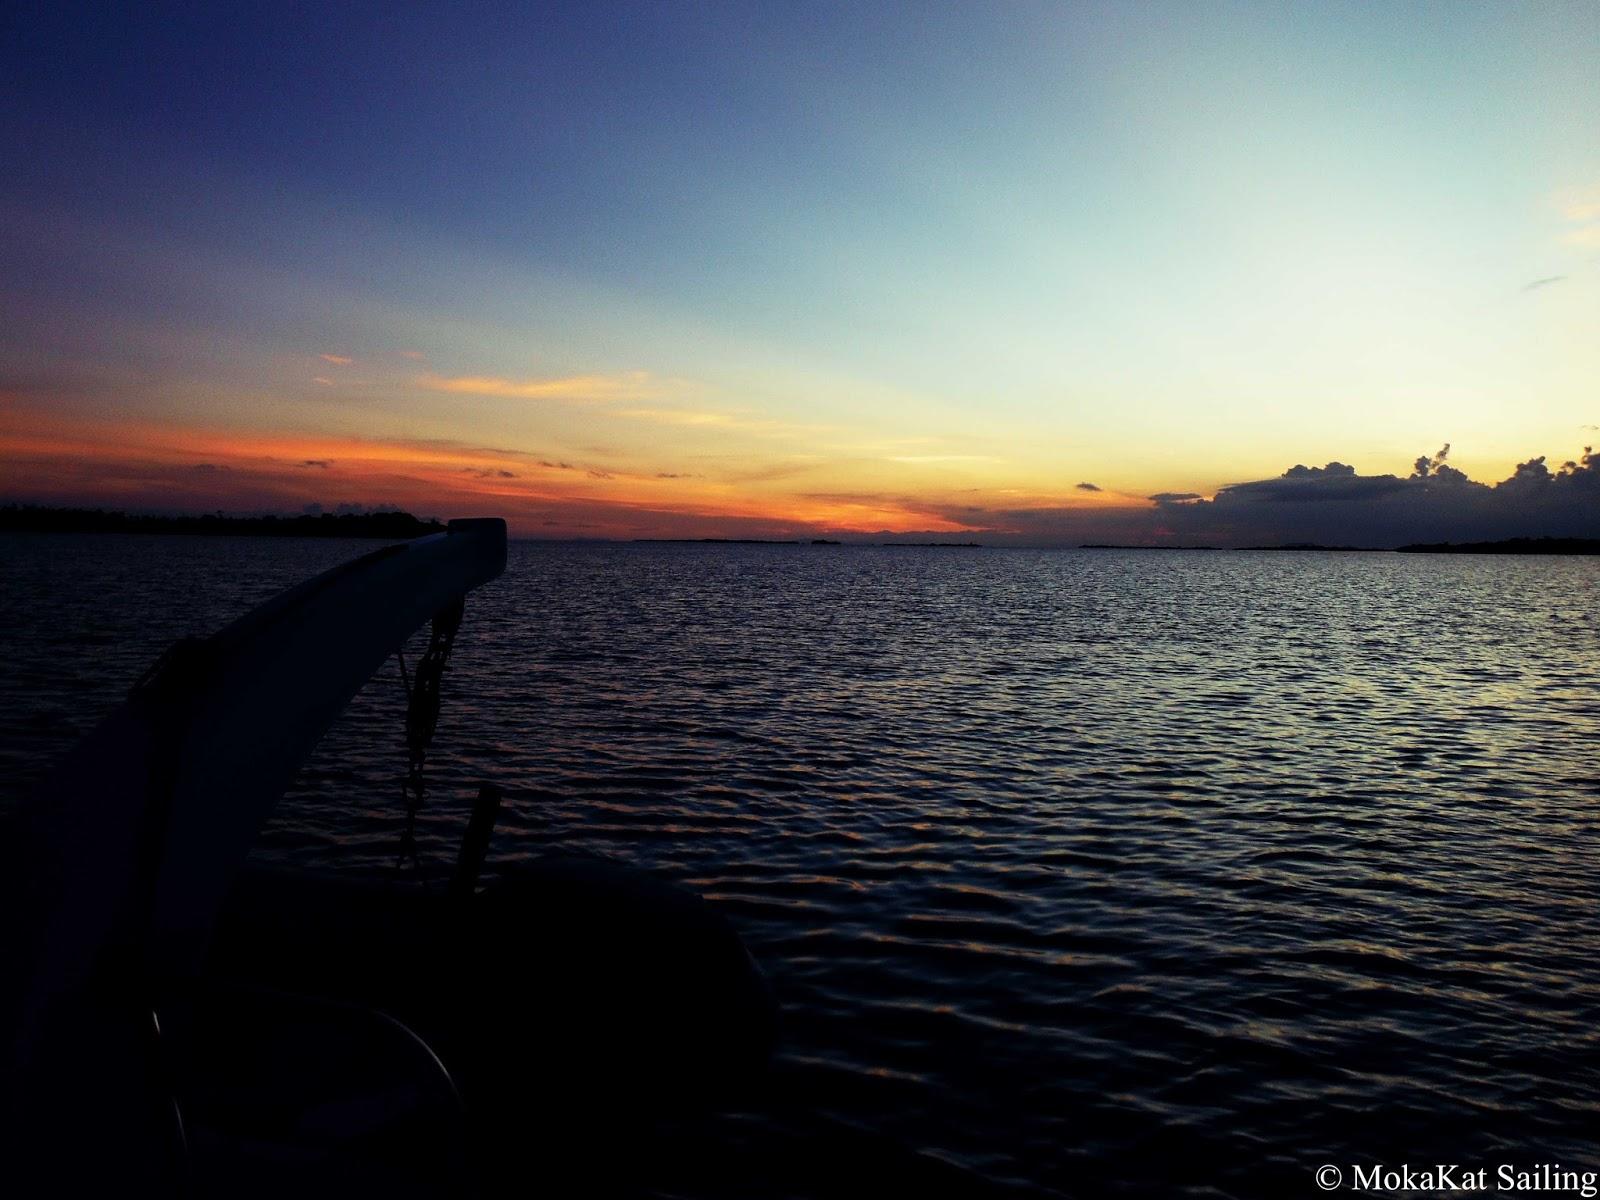 Seiling en katamaran i Belize og Rio Dulce i Guatemala